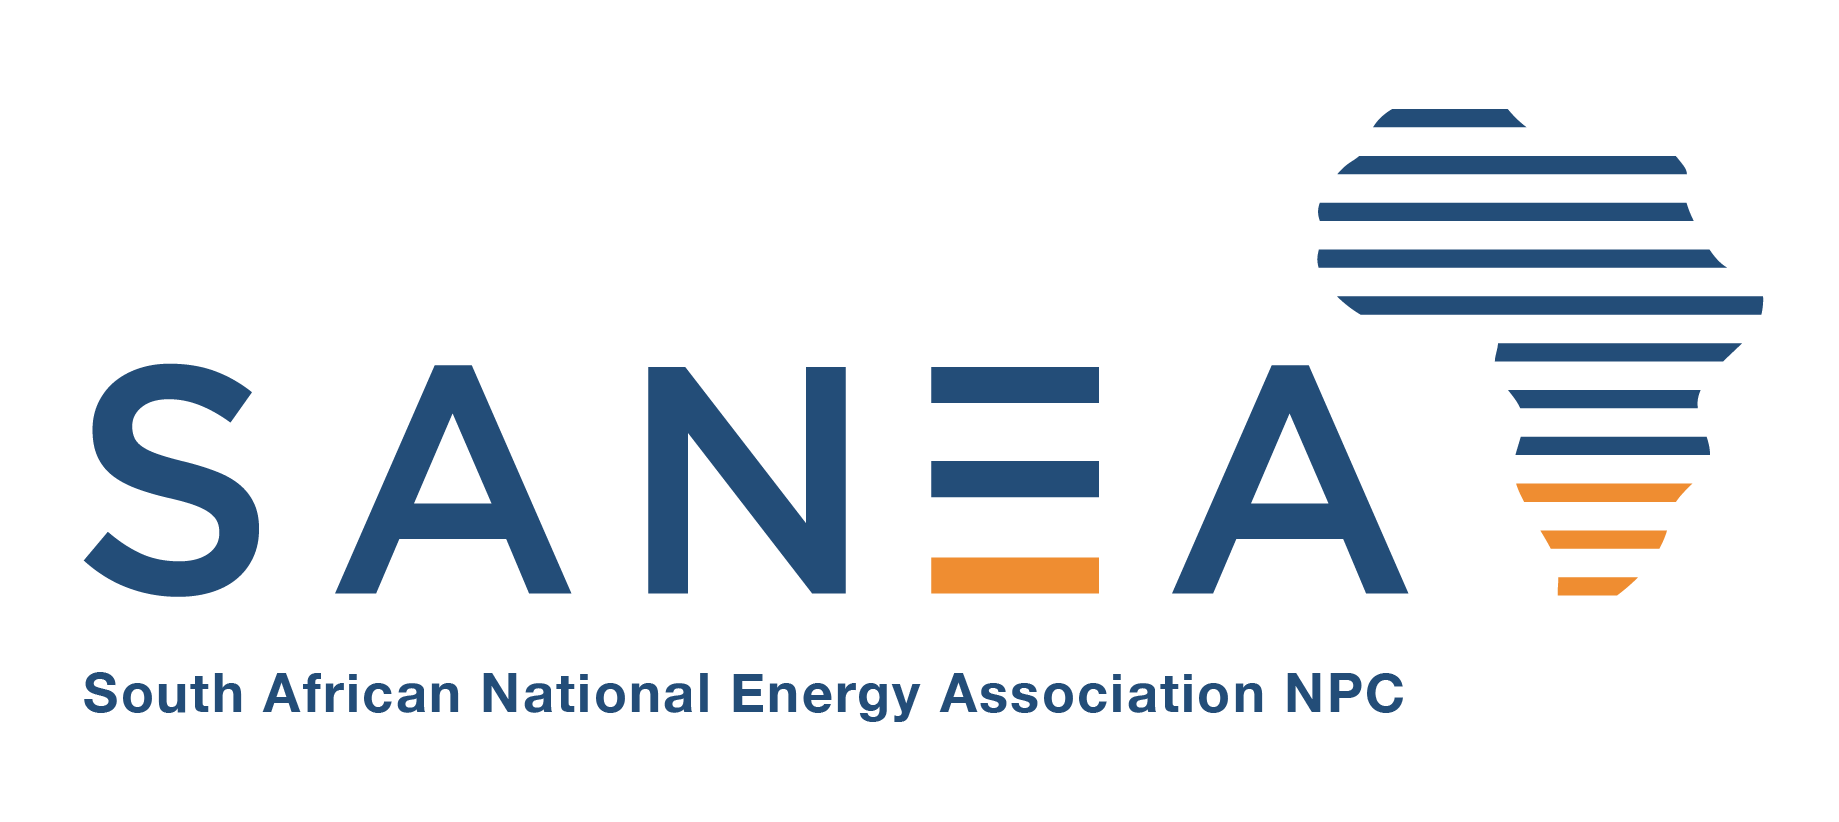 SANEA logo